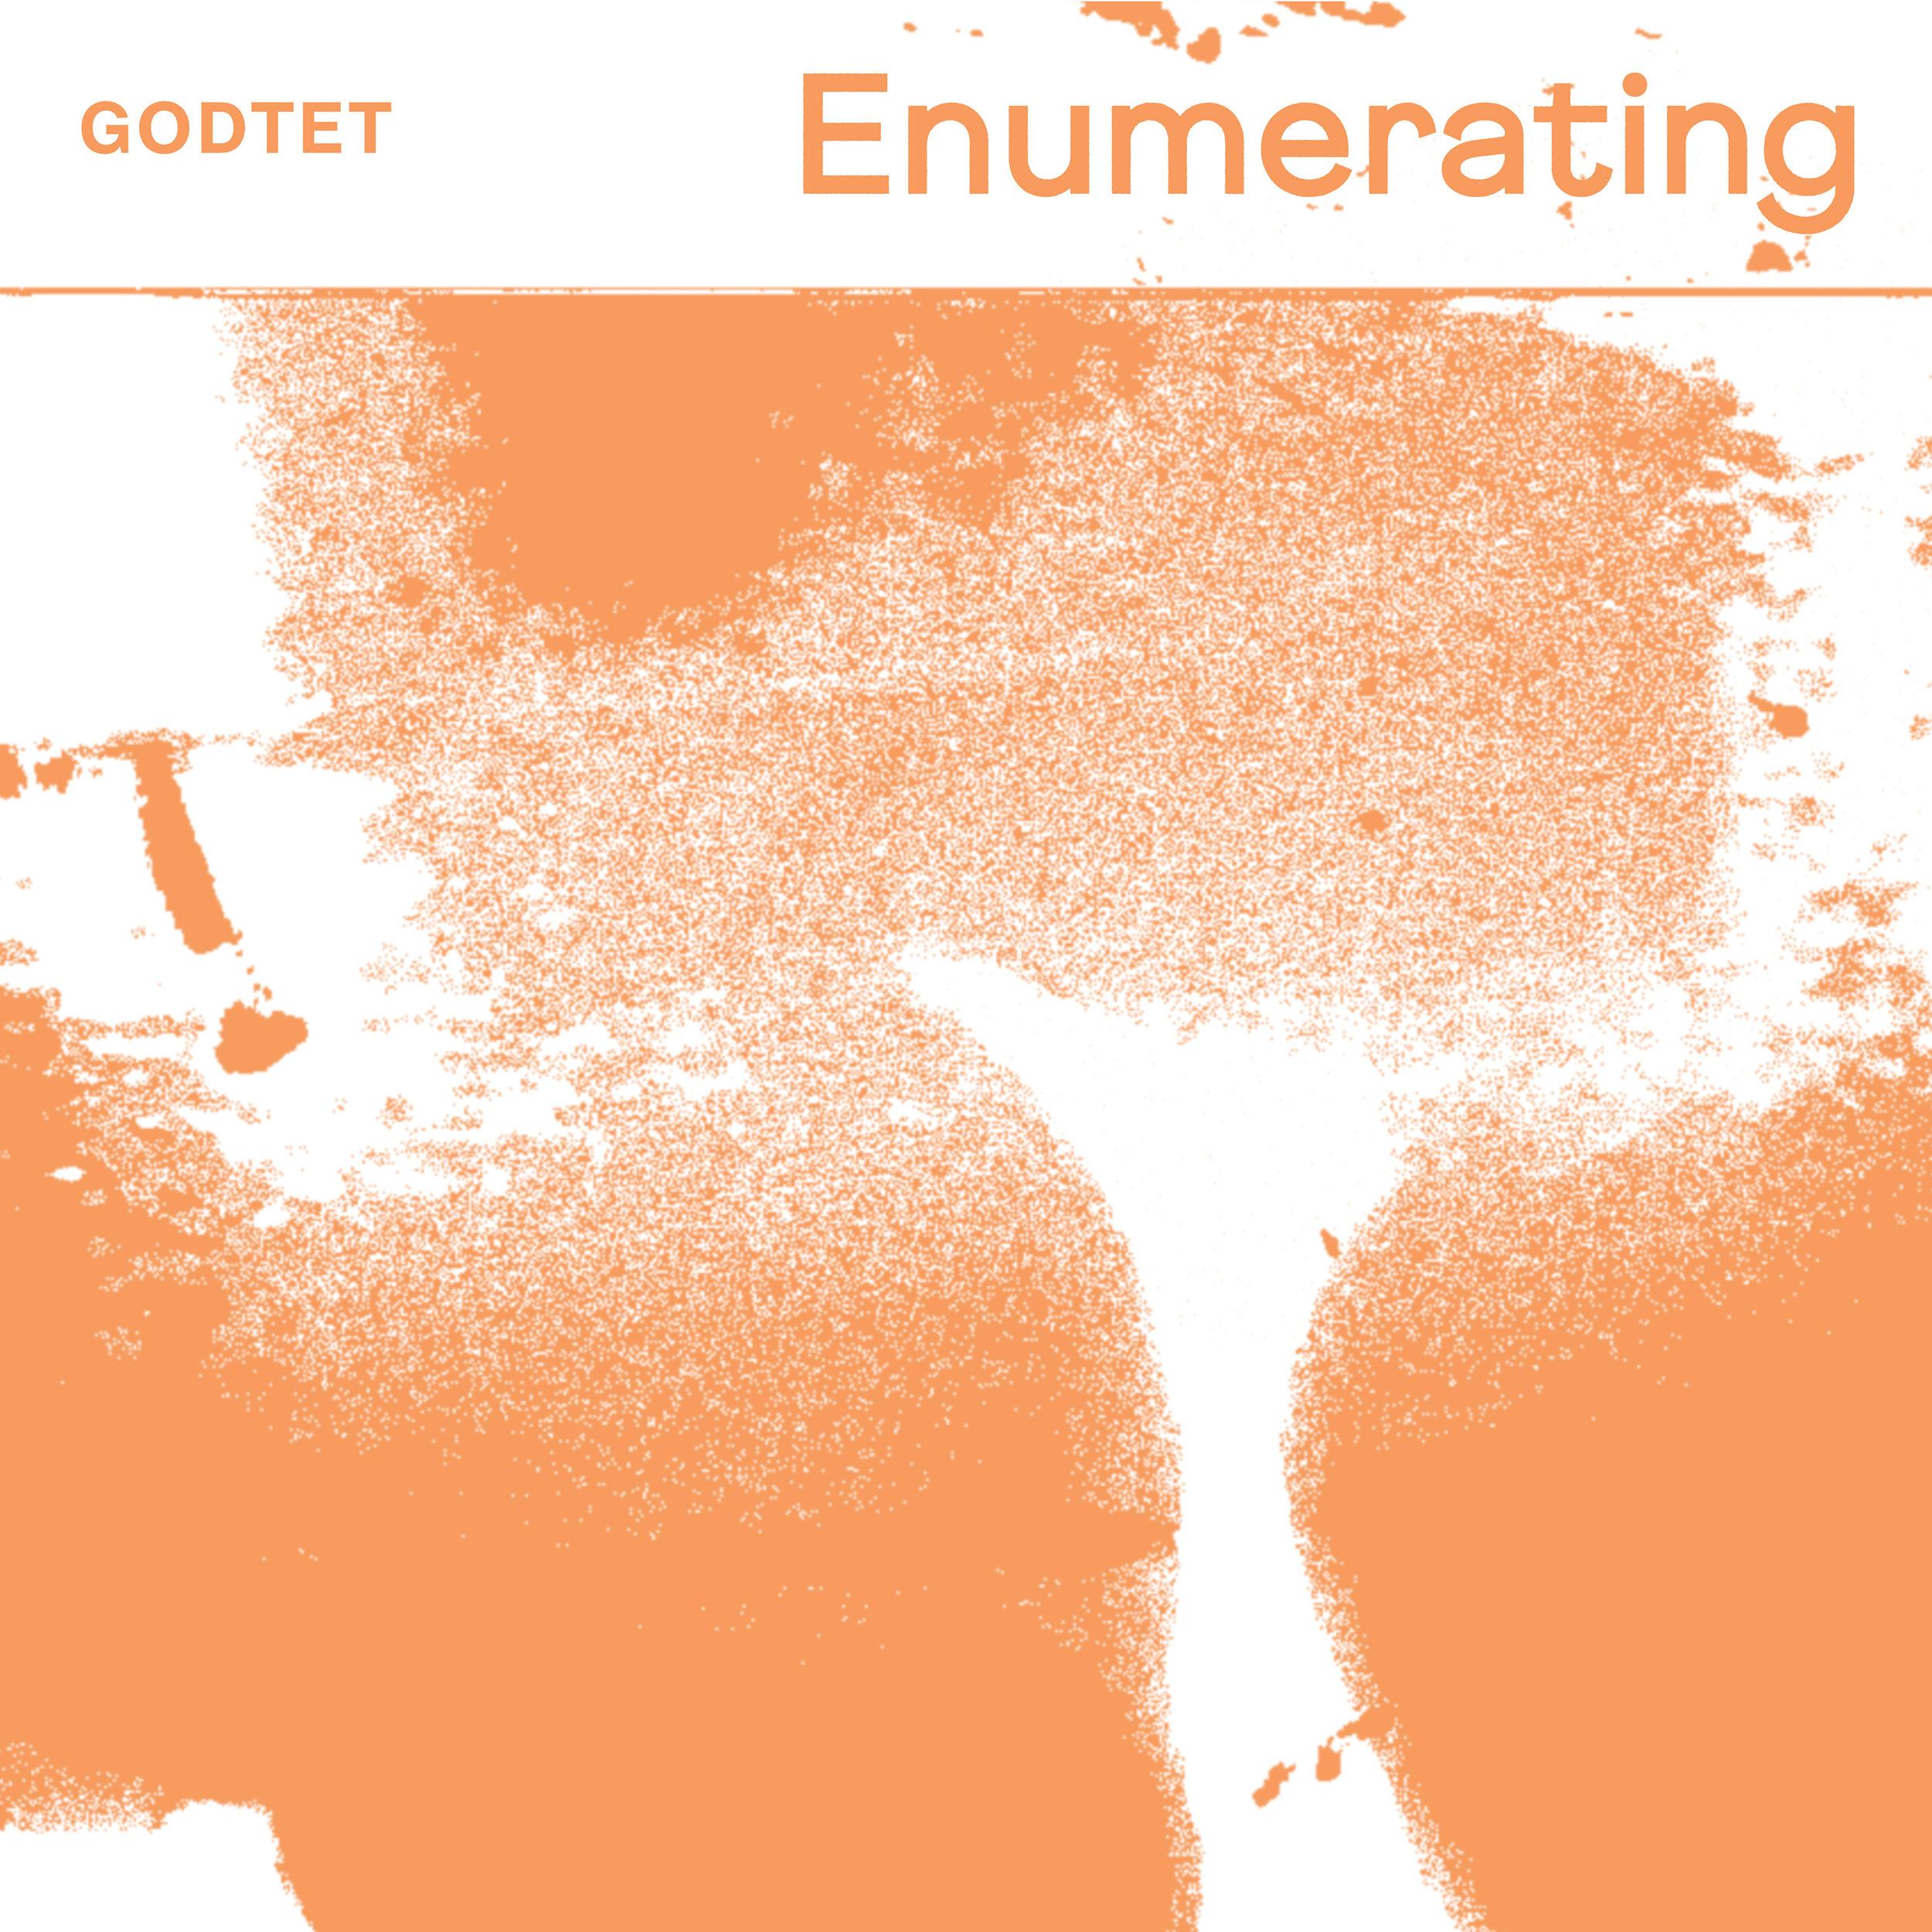 enumerating-3000.jpg